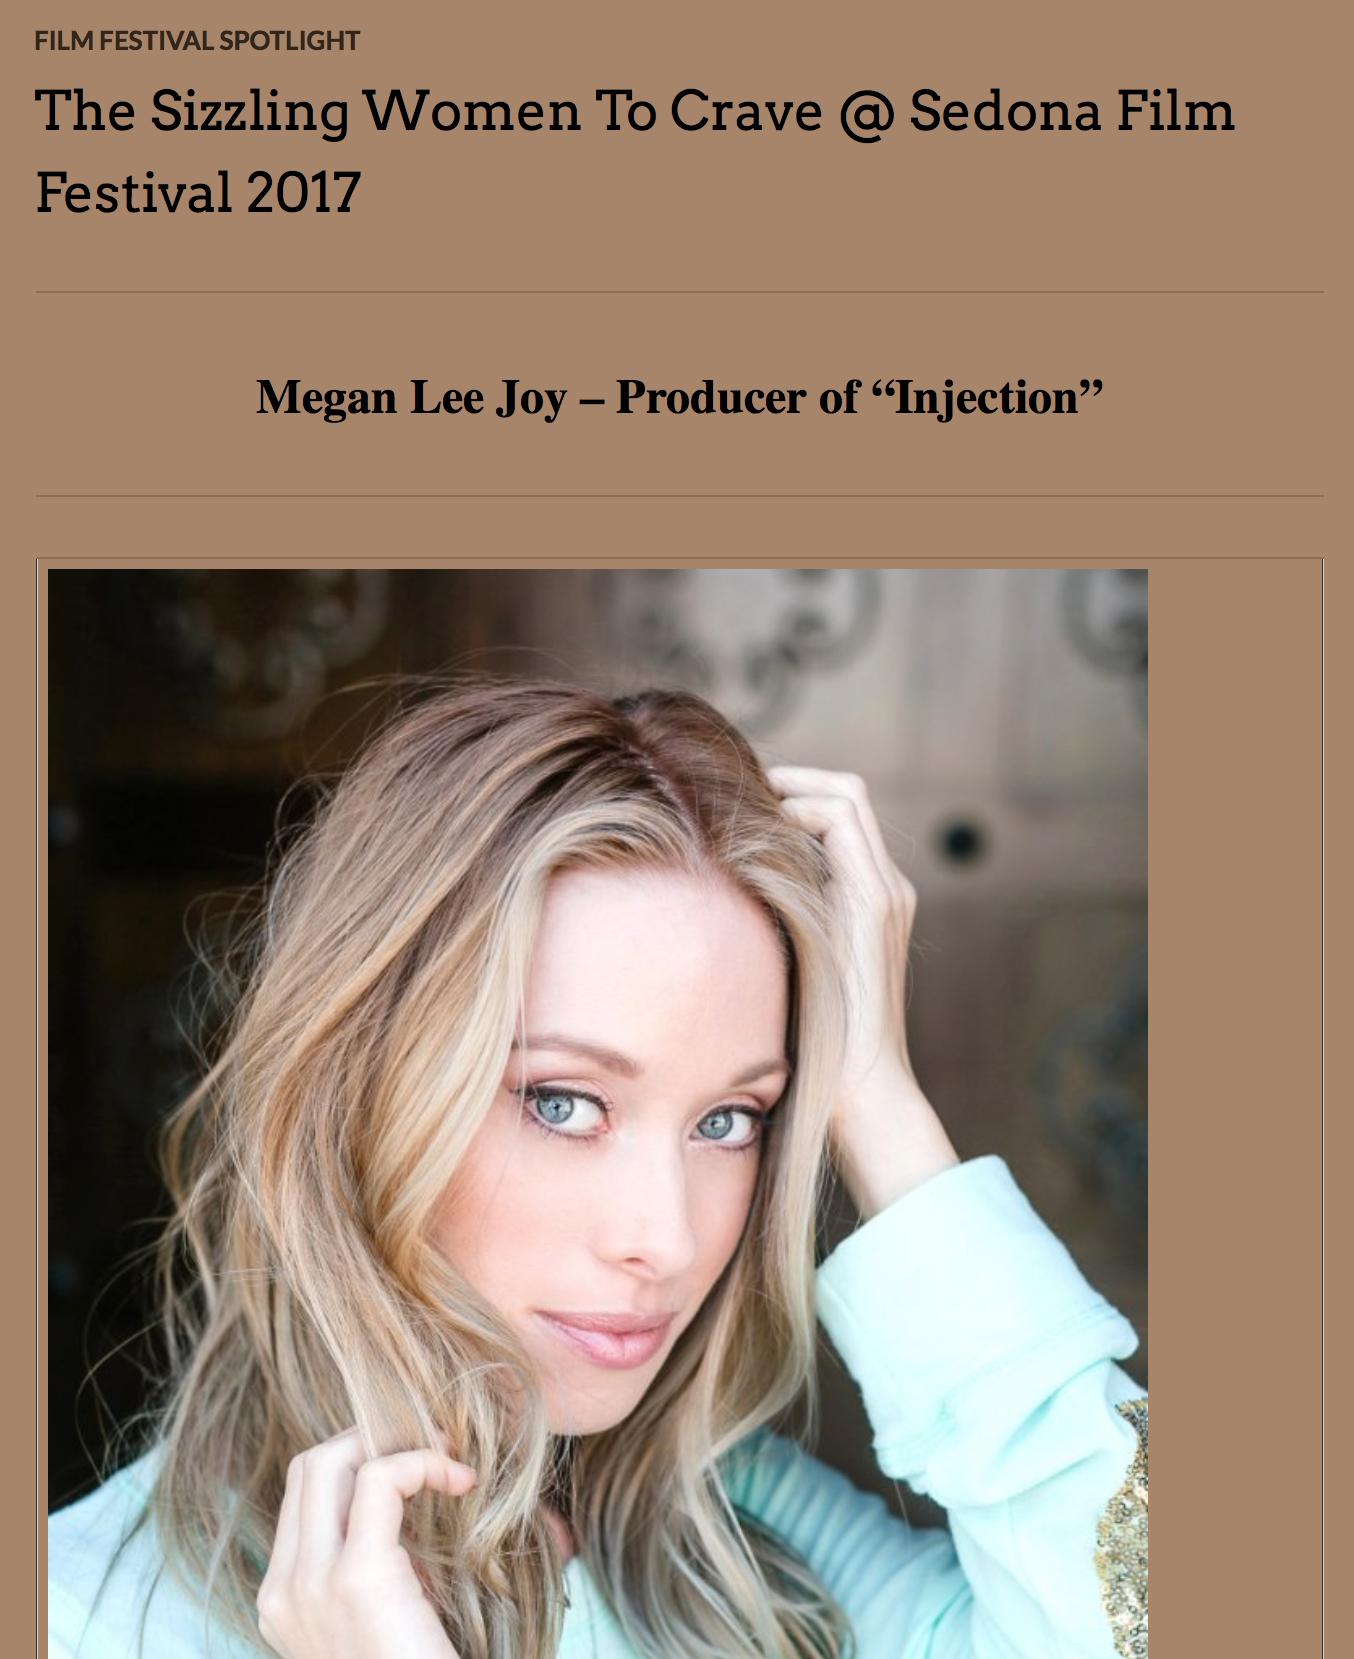 Megan Lee Joy, Sedona Film Festival